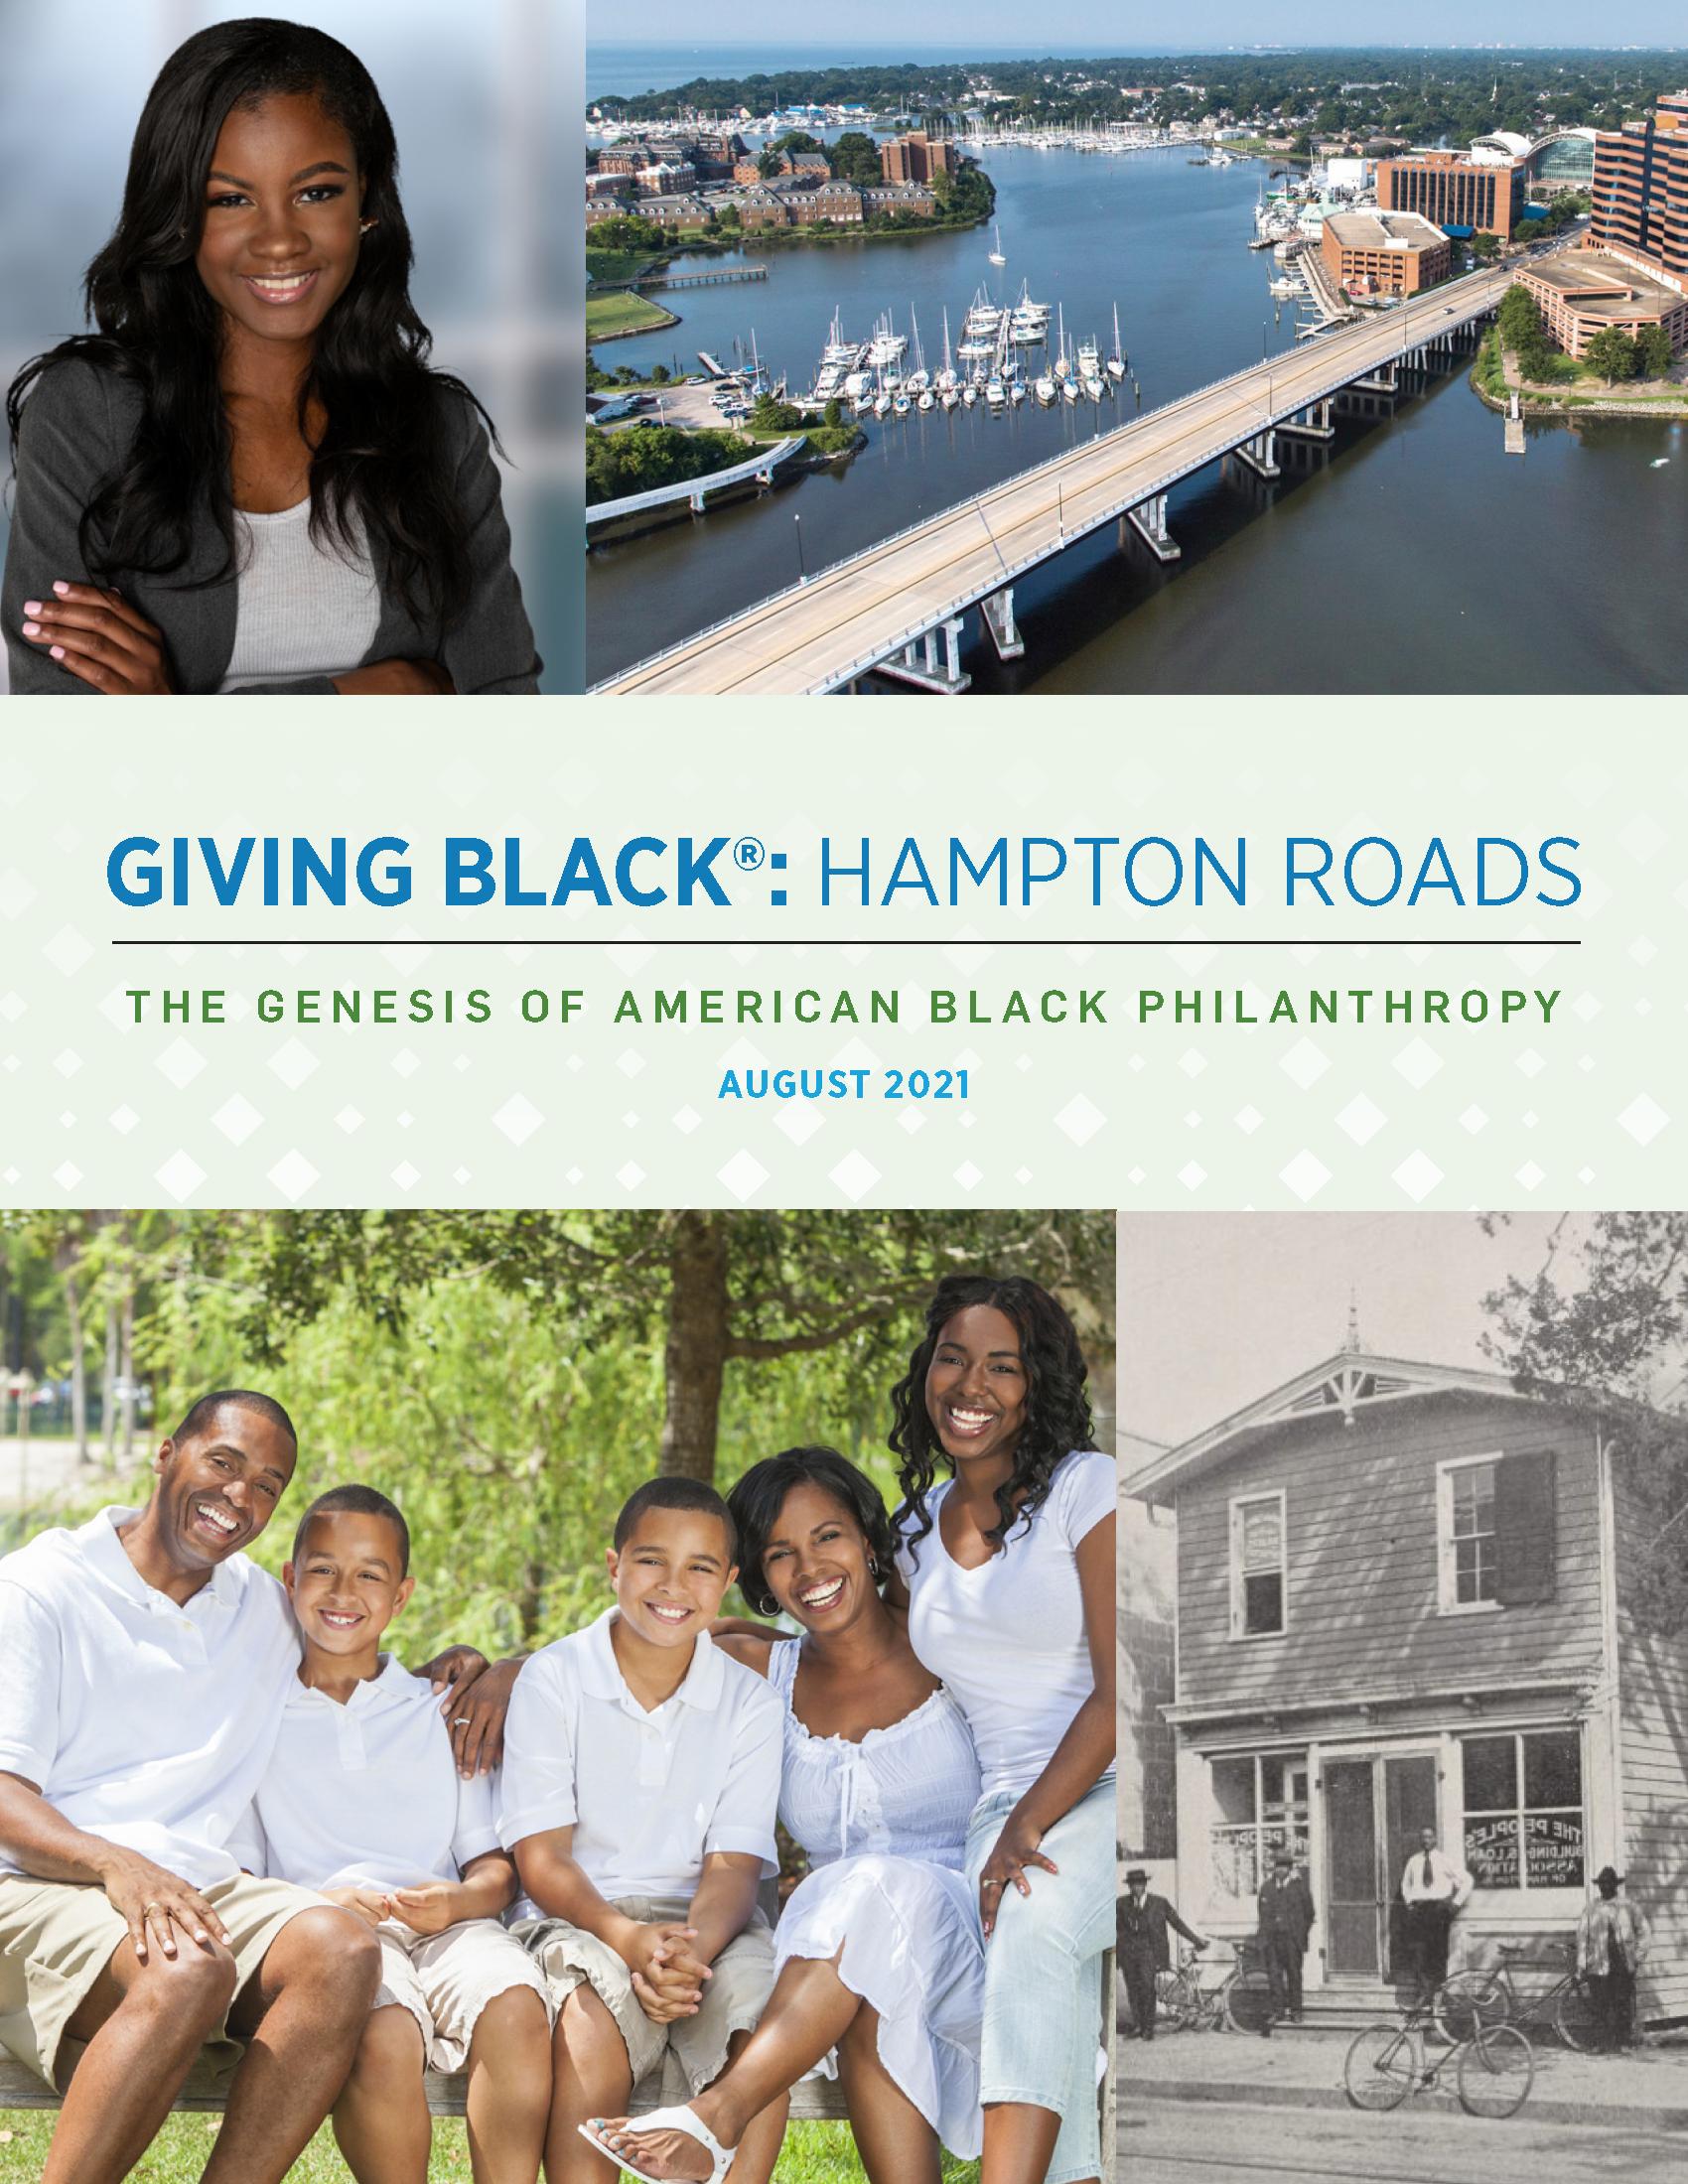 Giving Black® Hampton Roads